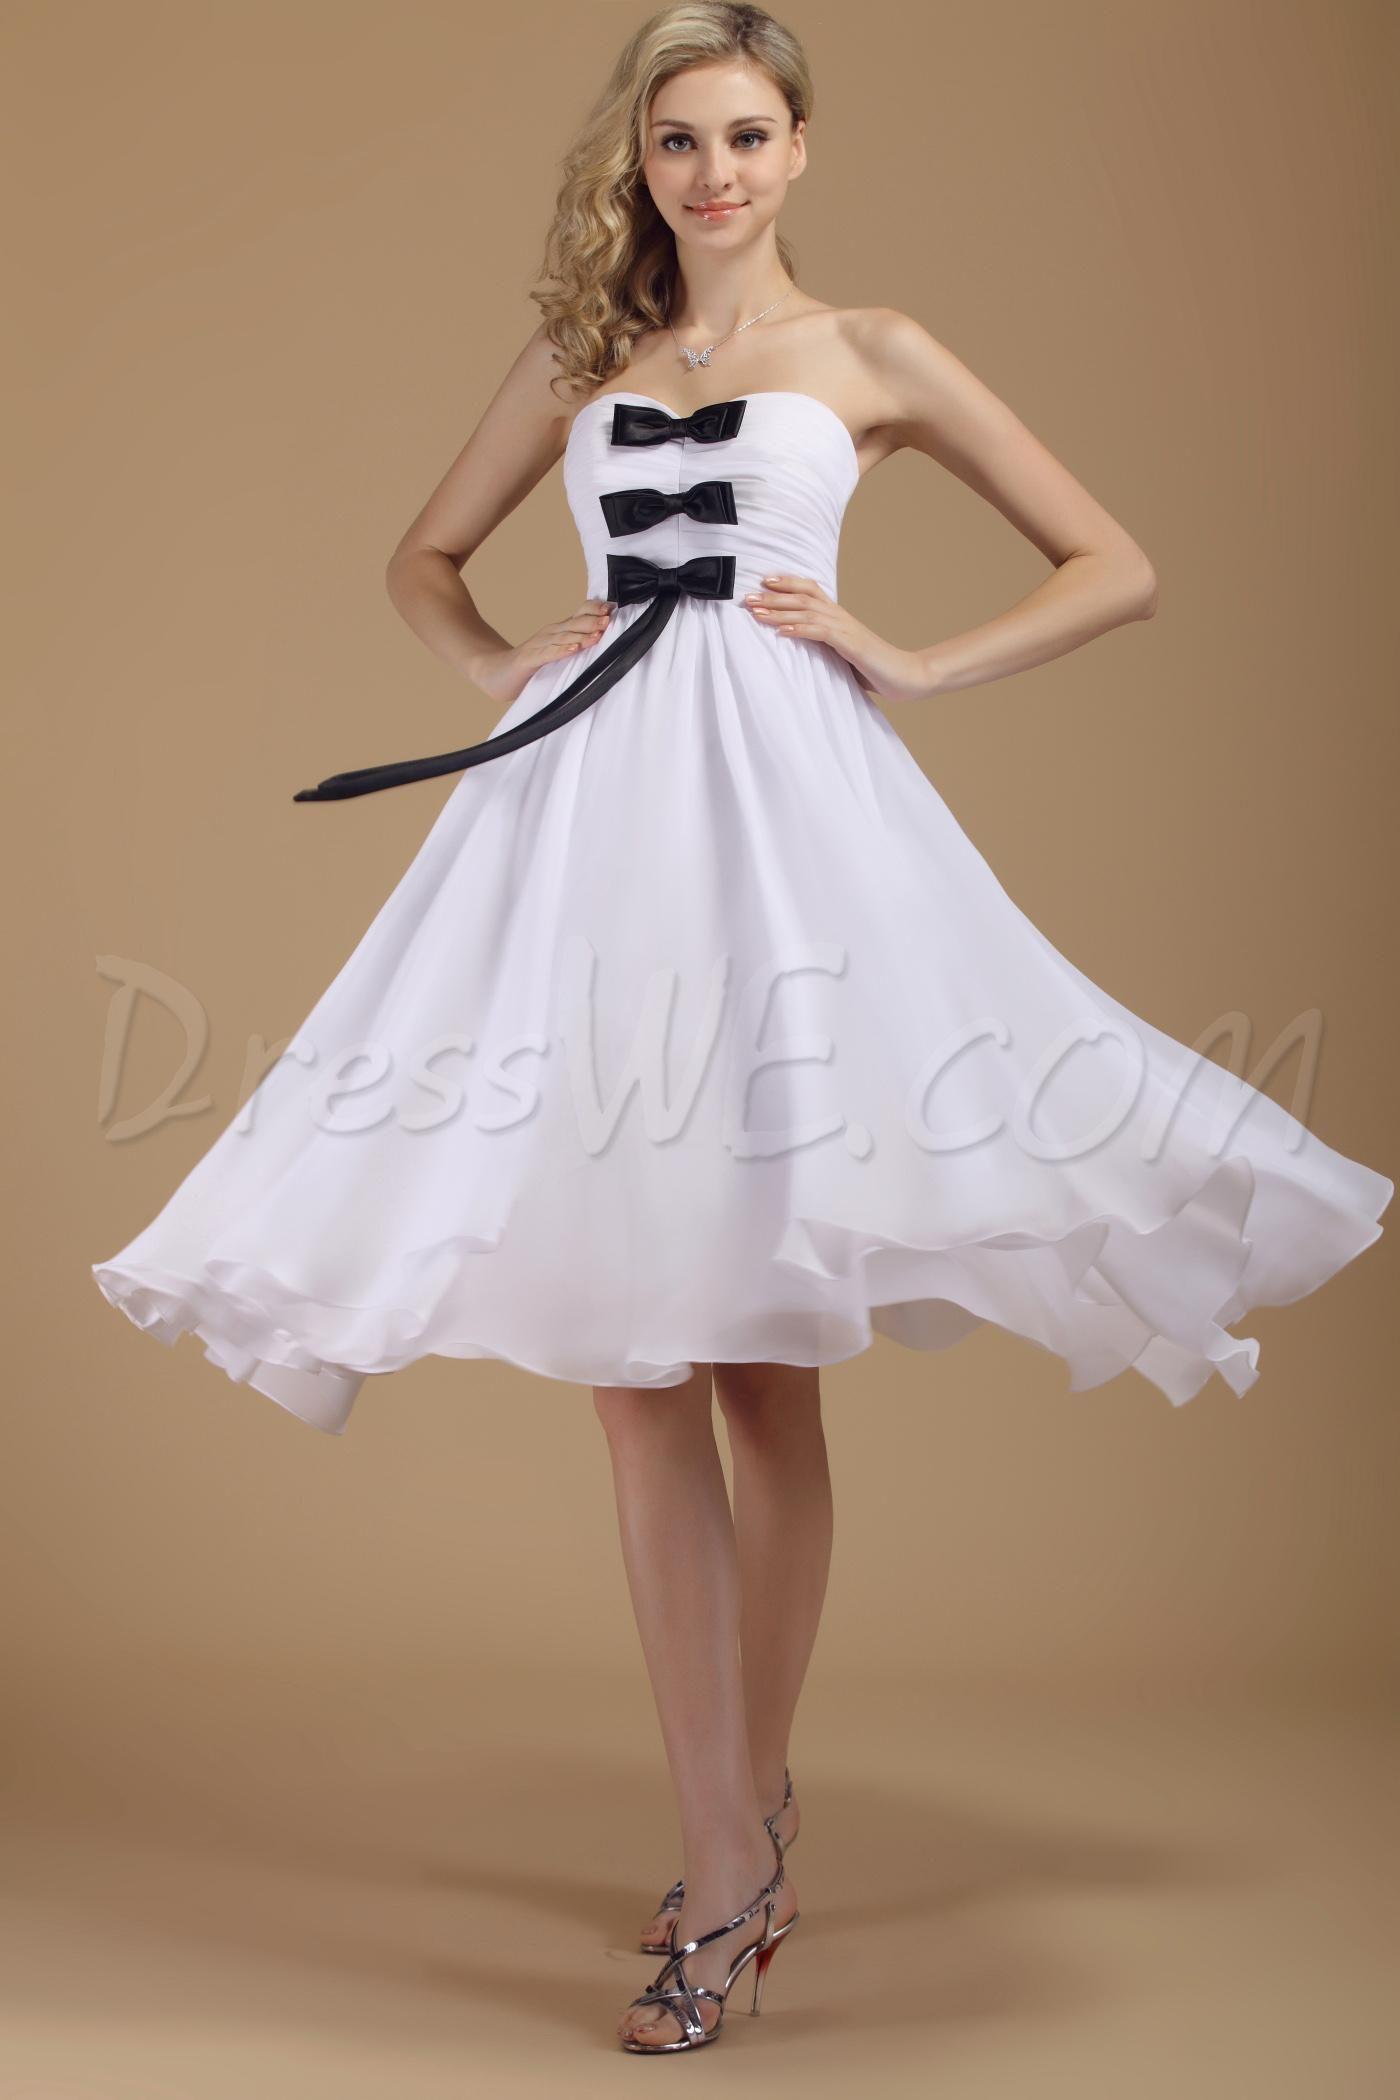 Knee length wedding dress   Dresswe SUPPLIES Concise Empire Sweetheart TeaLength